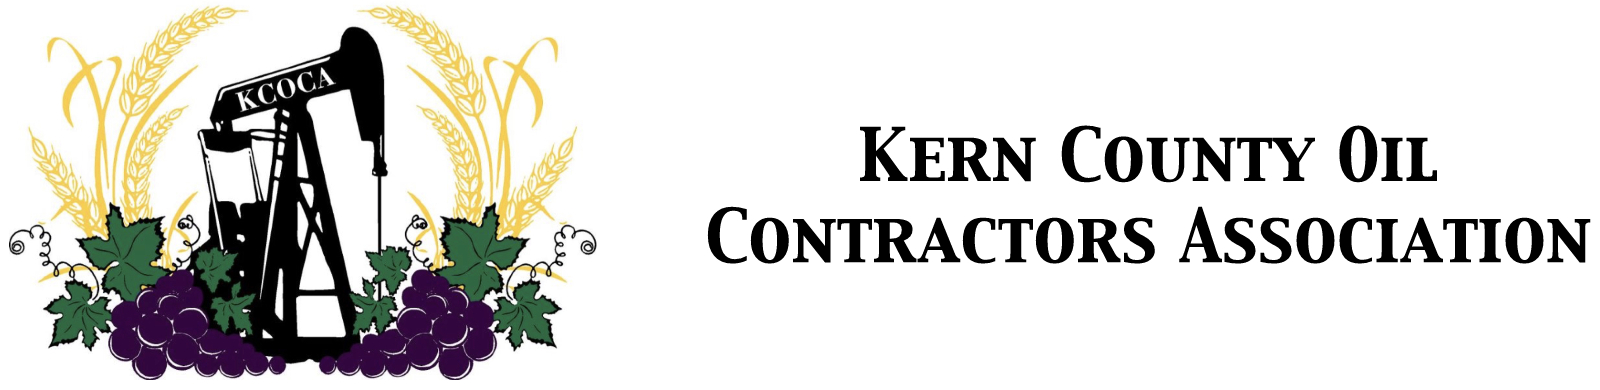 Kern County Oil Contractors Association